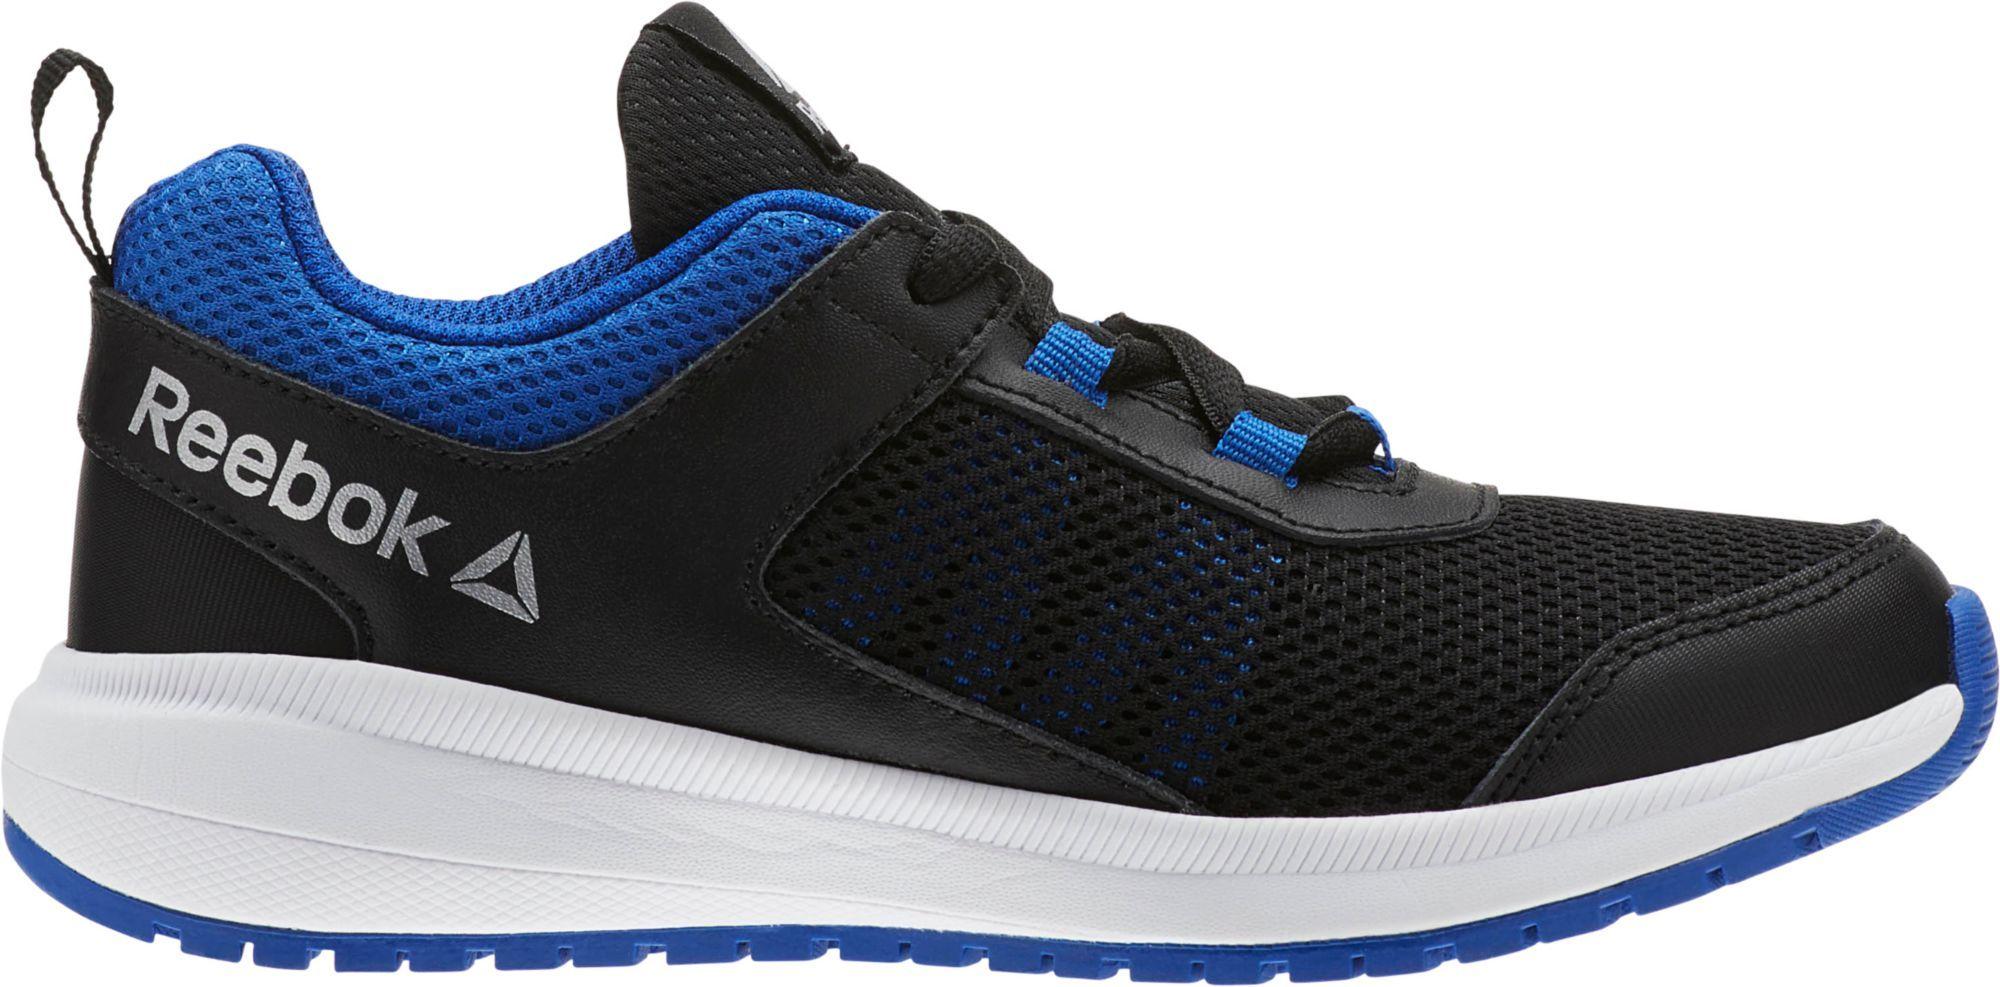 c946a56cc96 Reebok Kids  Grade School Road Supreme Running Shoes in 2018 ...